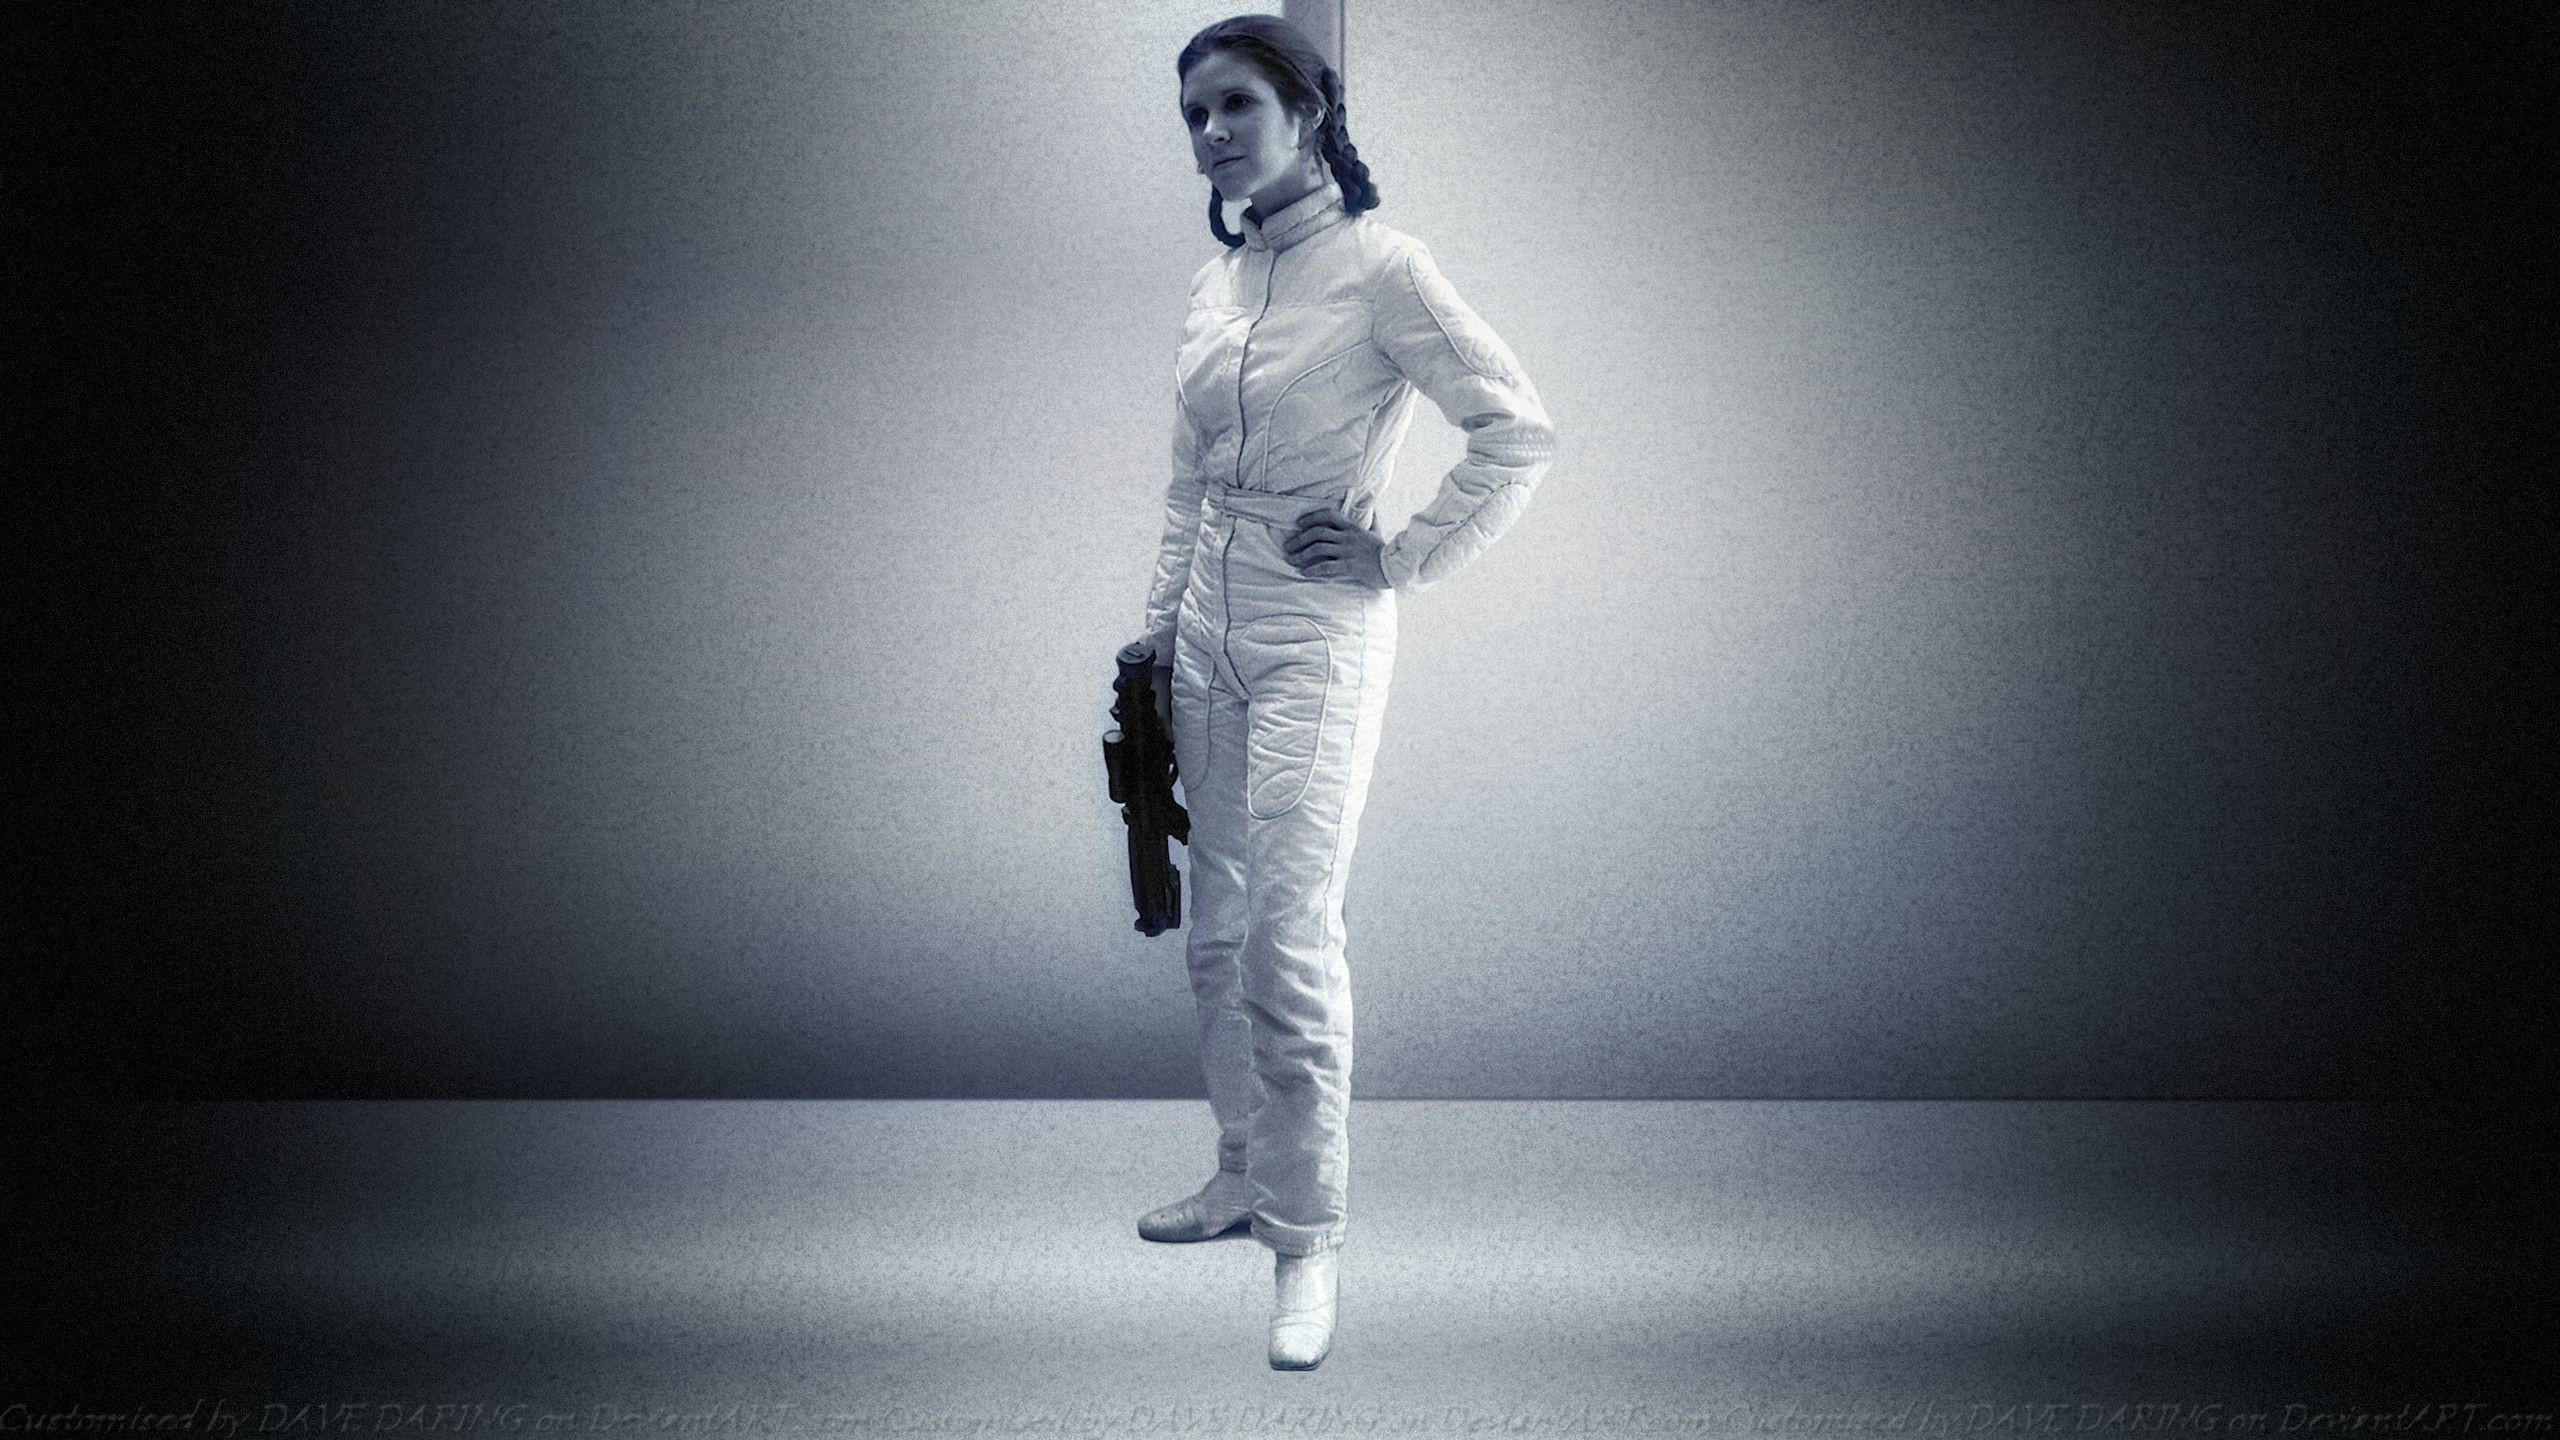 Princess Leia Wallpaper 74 Images